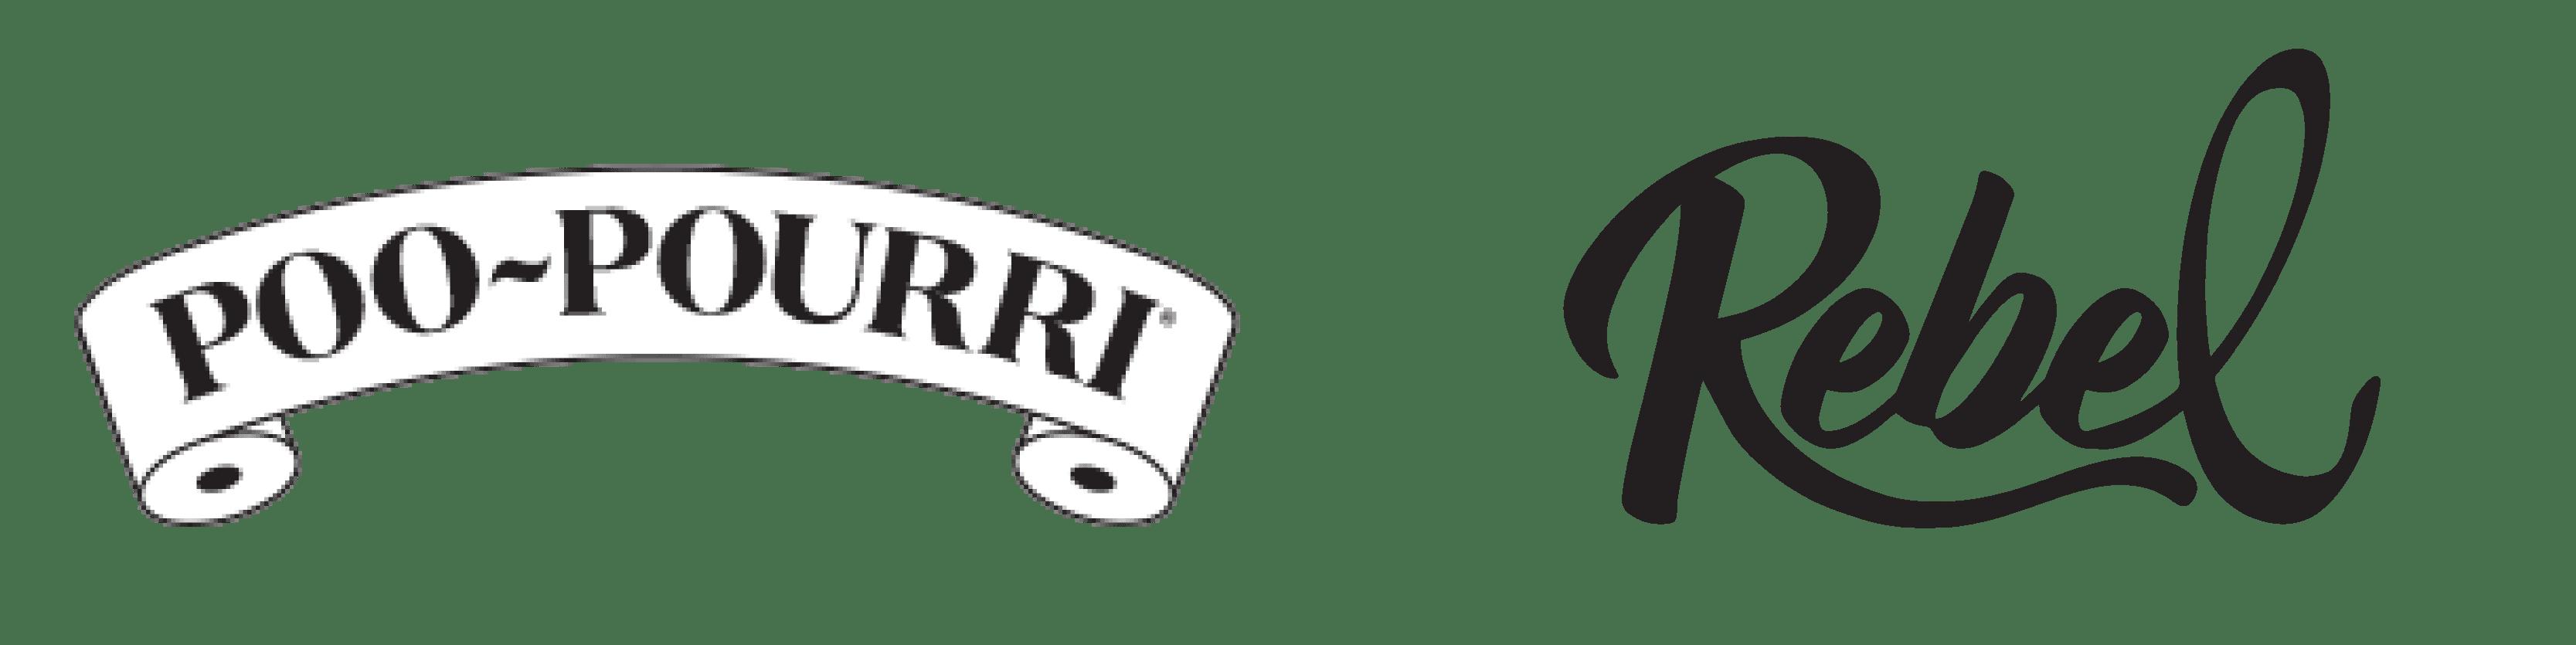 January On Conversations Logos